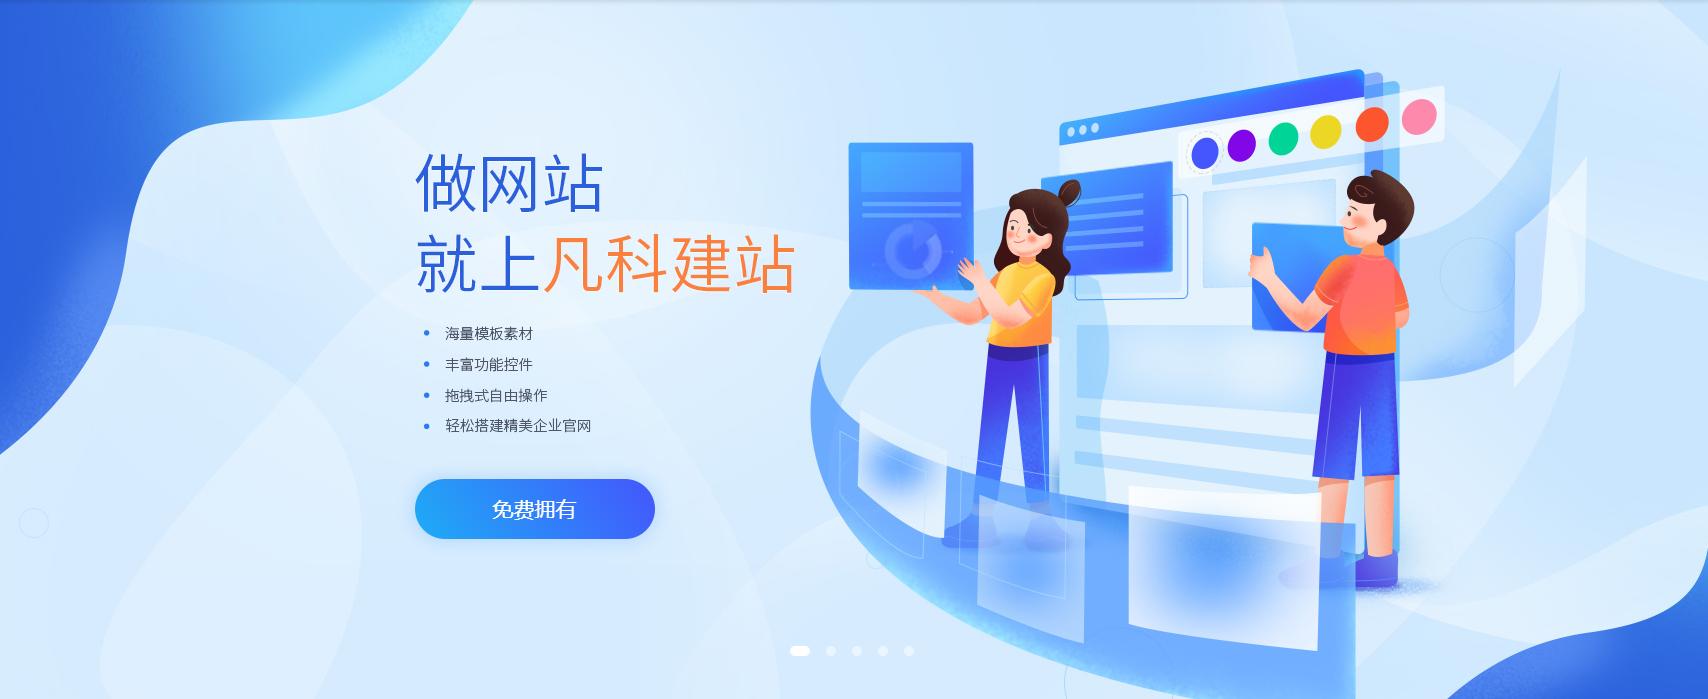 中小企业网站建设